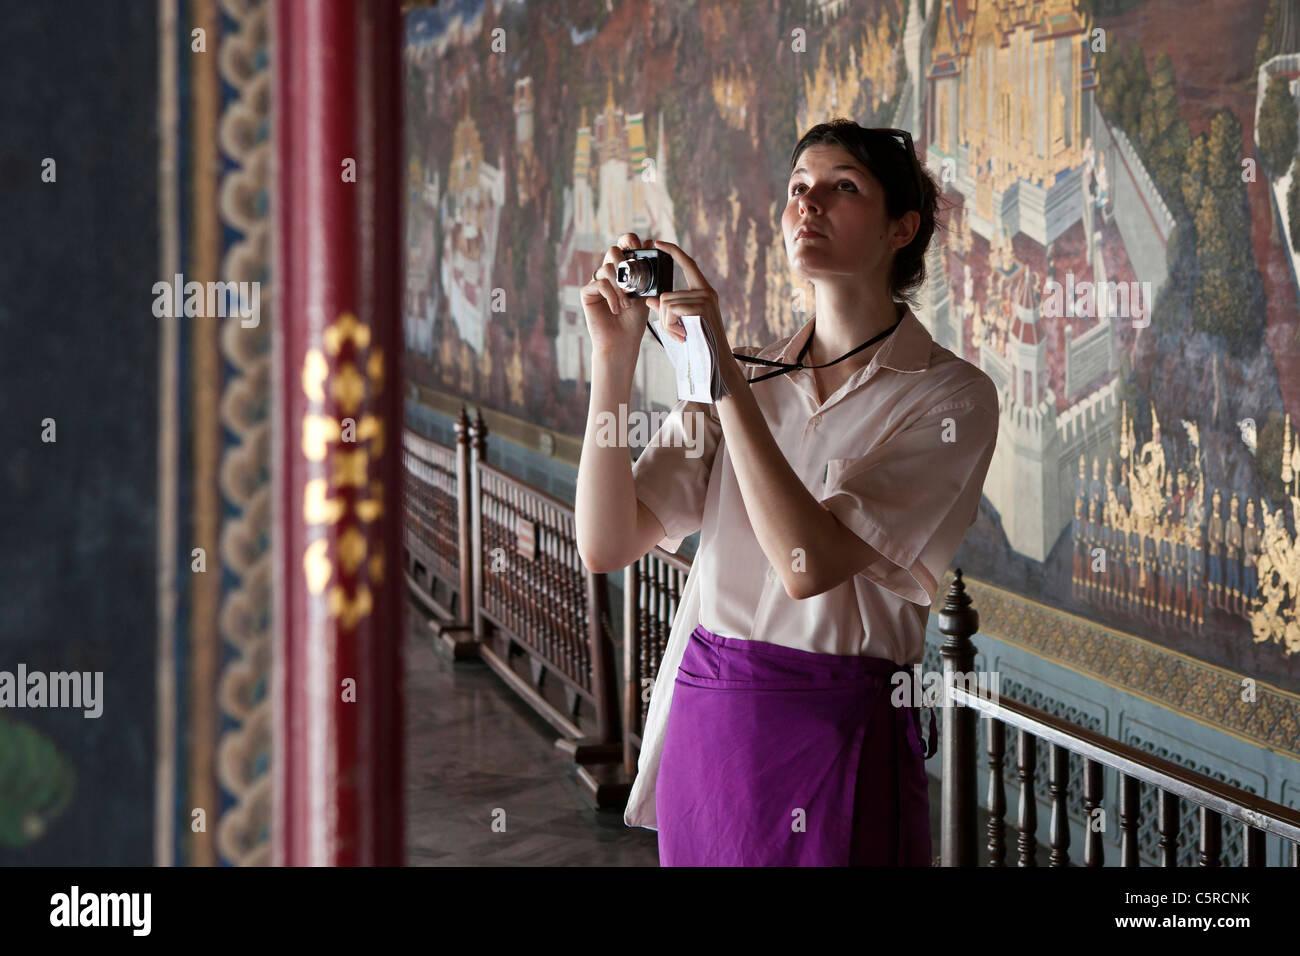 Tourist taking photographs in The Grand Palace, Bangkok, Thailand Stock Photo